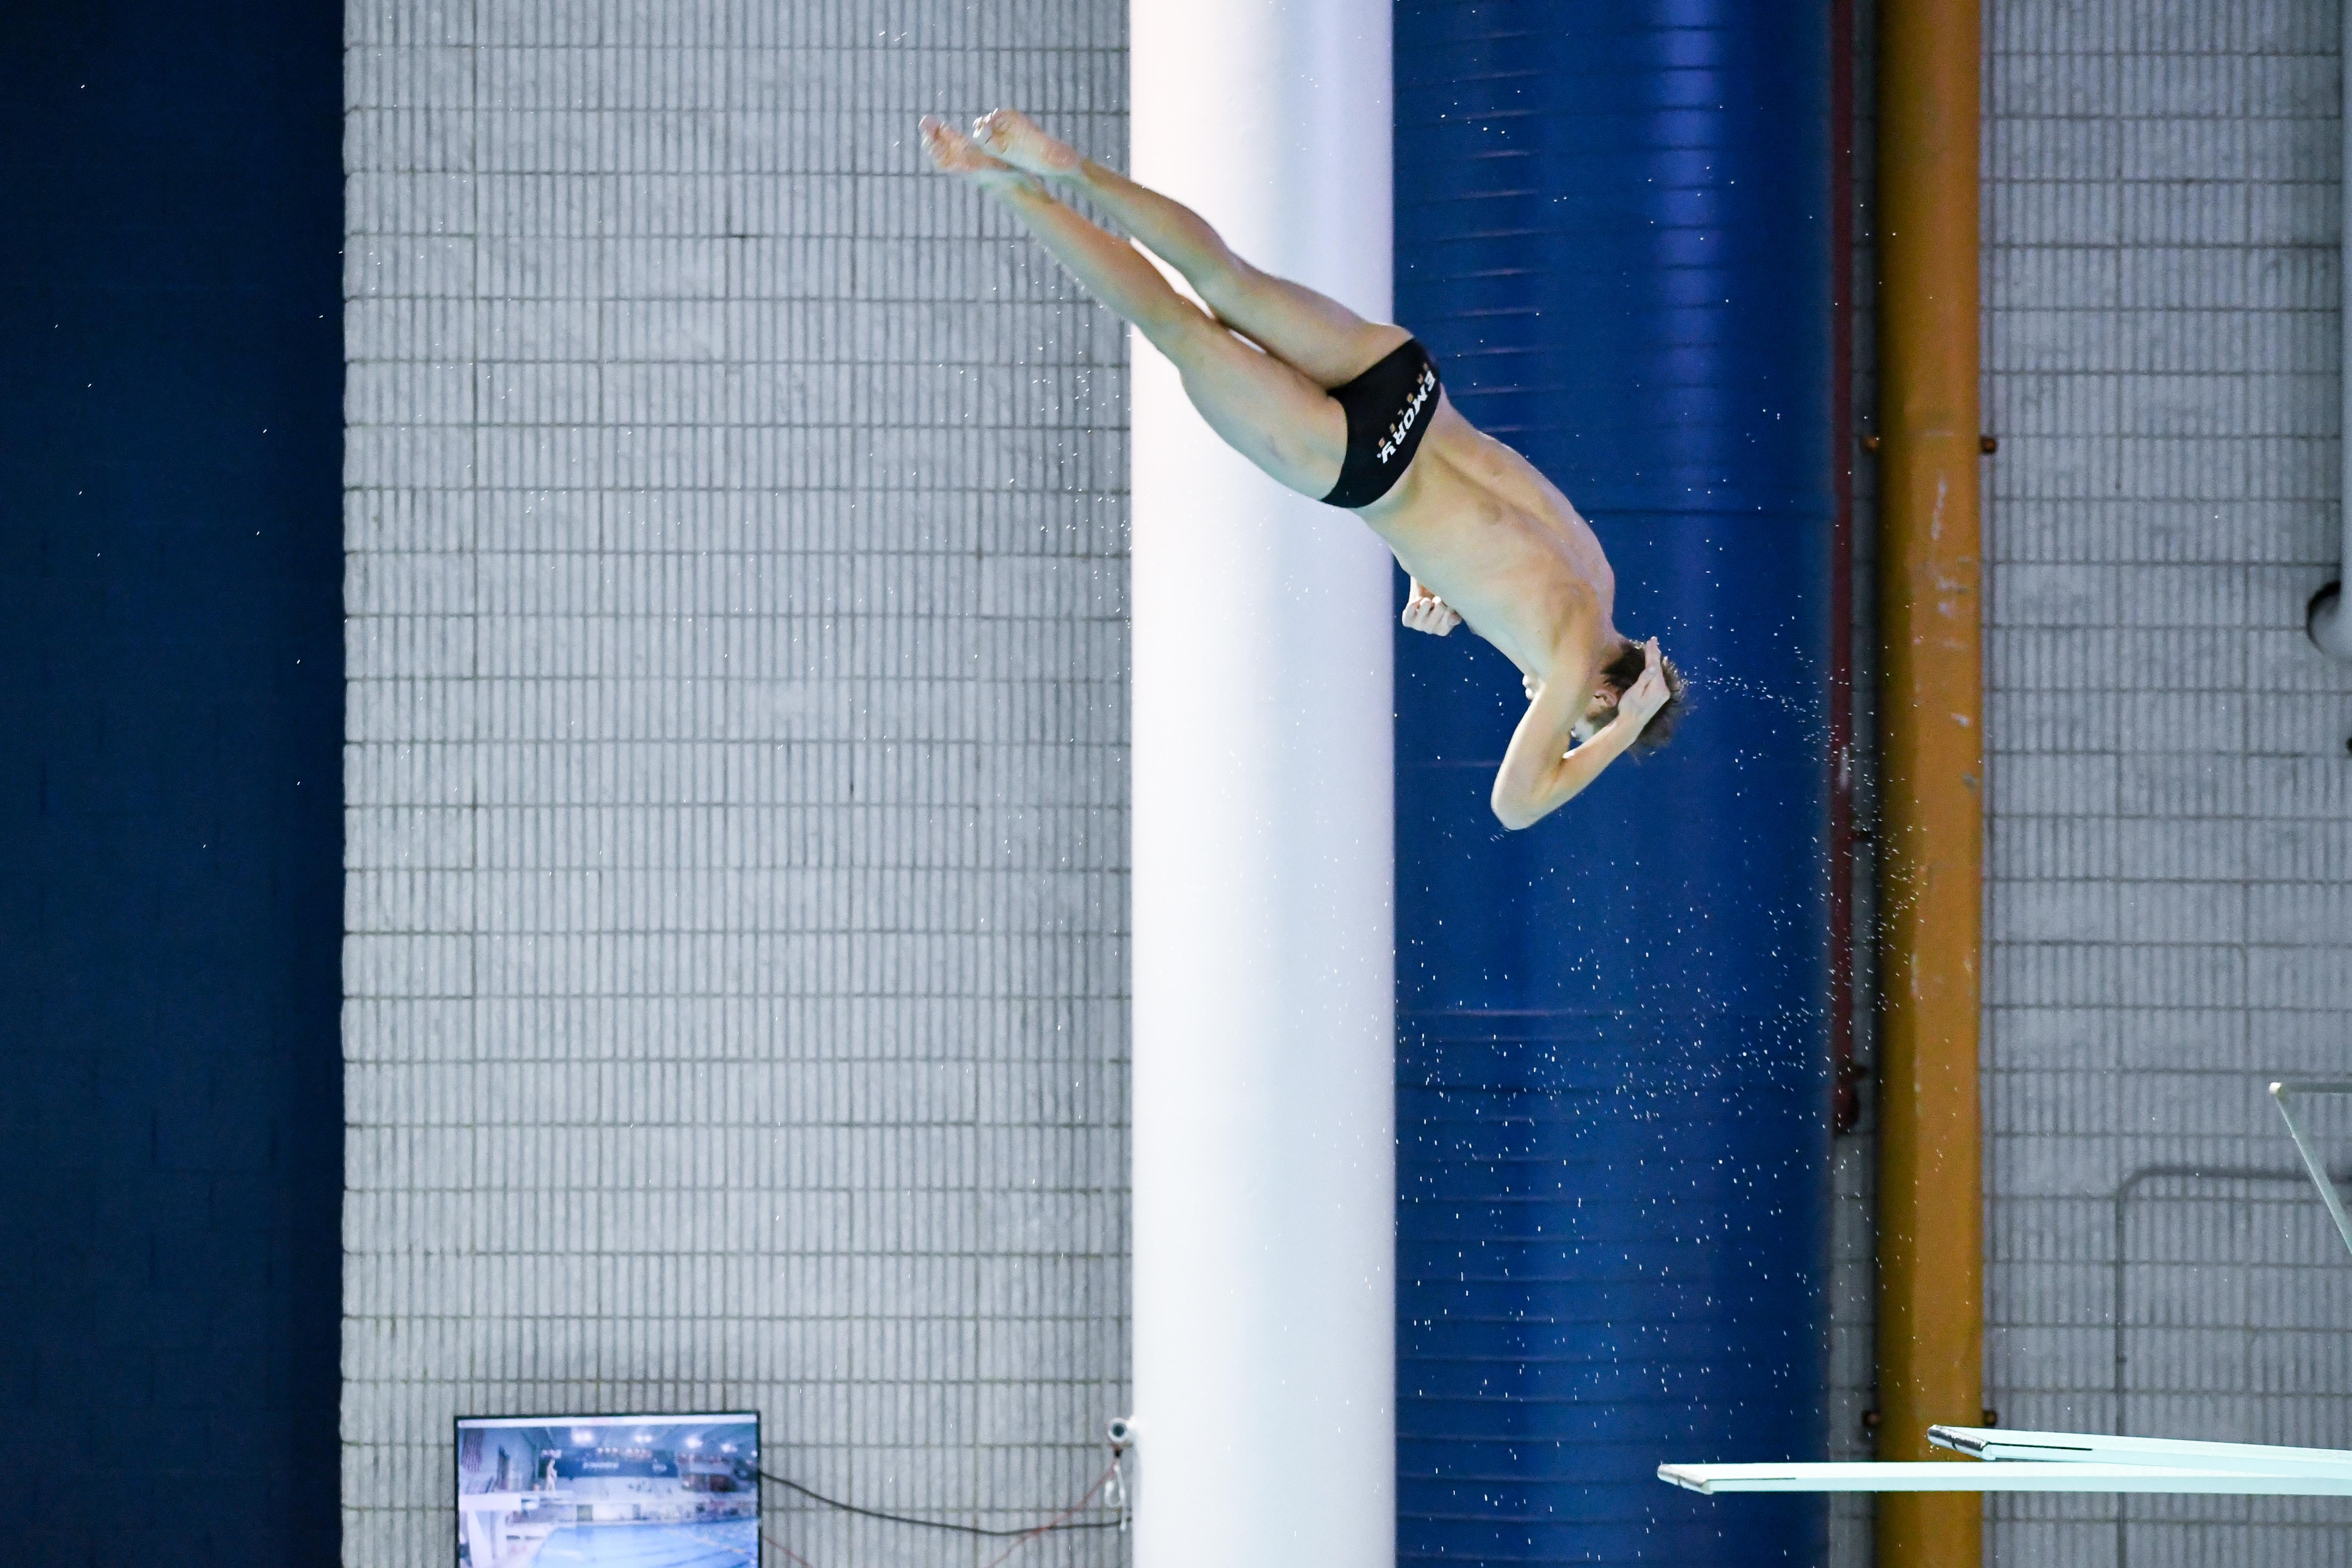 Bumgarner Sets School Record in 1-Meter Dive